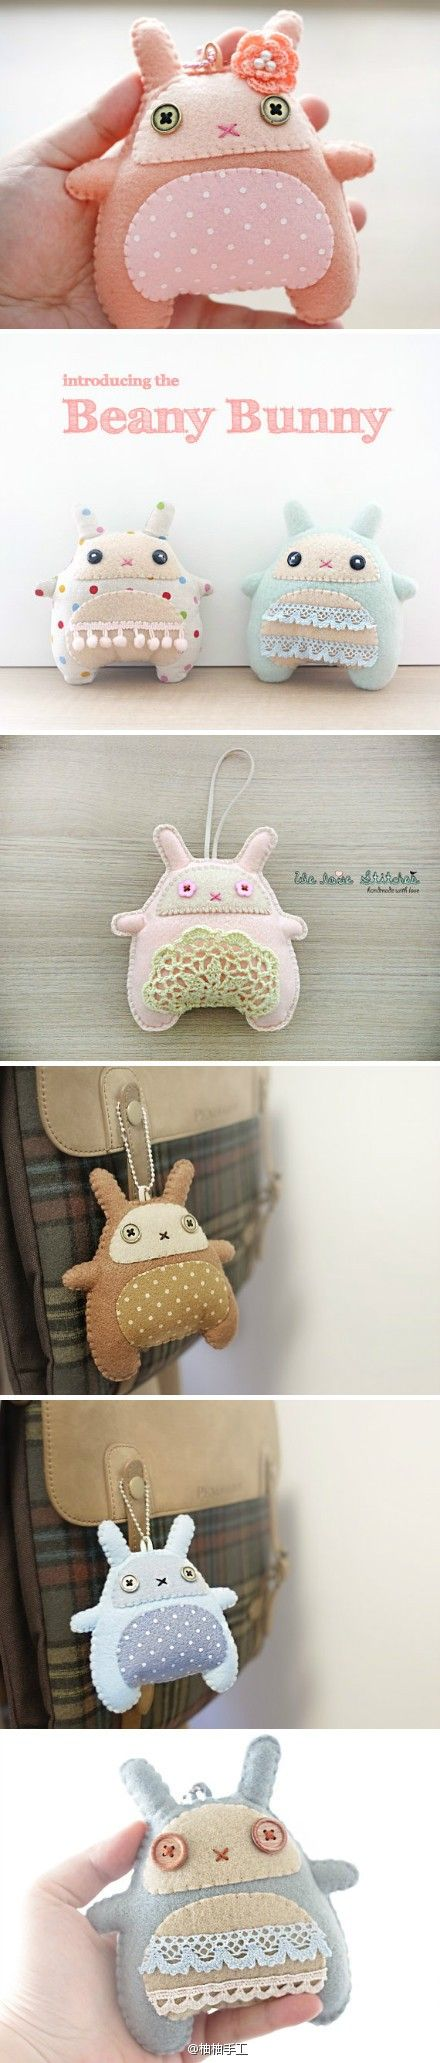 胖兔子钥匙挂坠——来自柚柚手工 (Fat rabbit key pendants - handmade from Youyou)